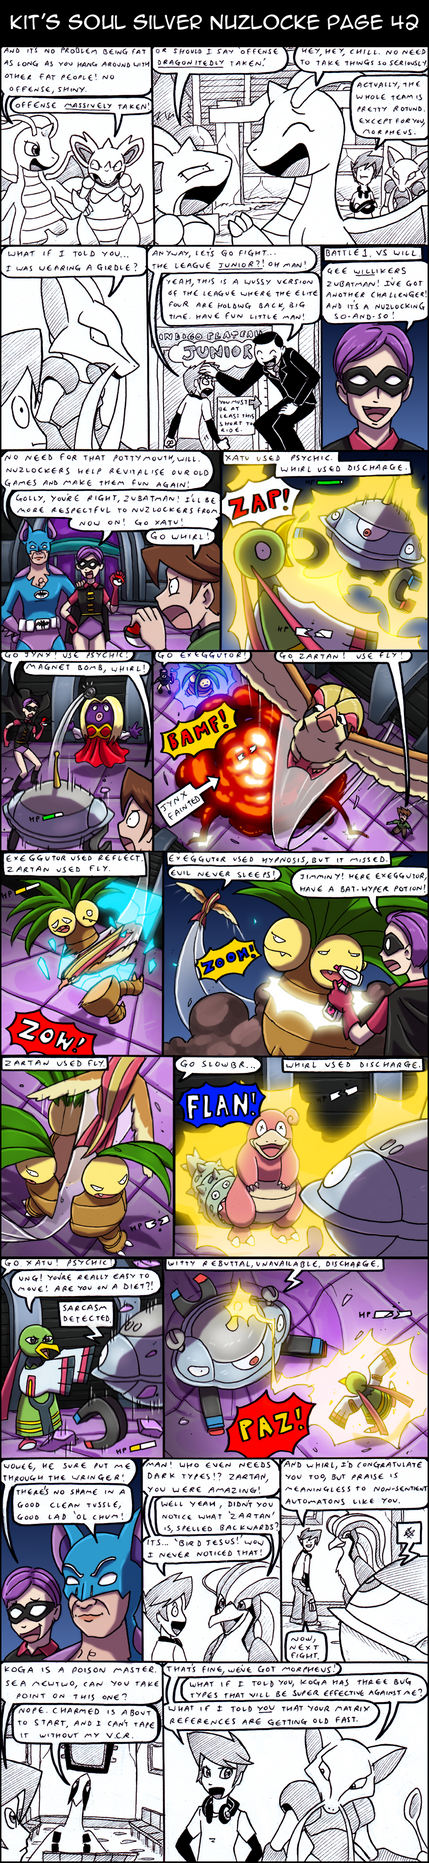 Kit's Soul Silver Nuzlocke page 42 by kitfox-crimson